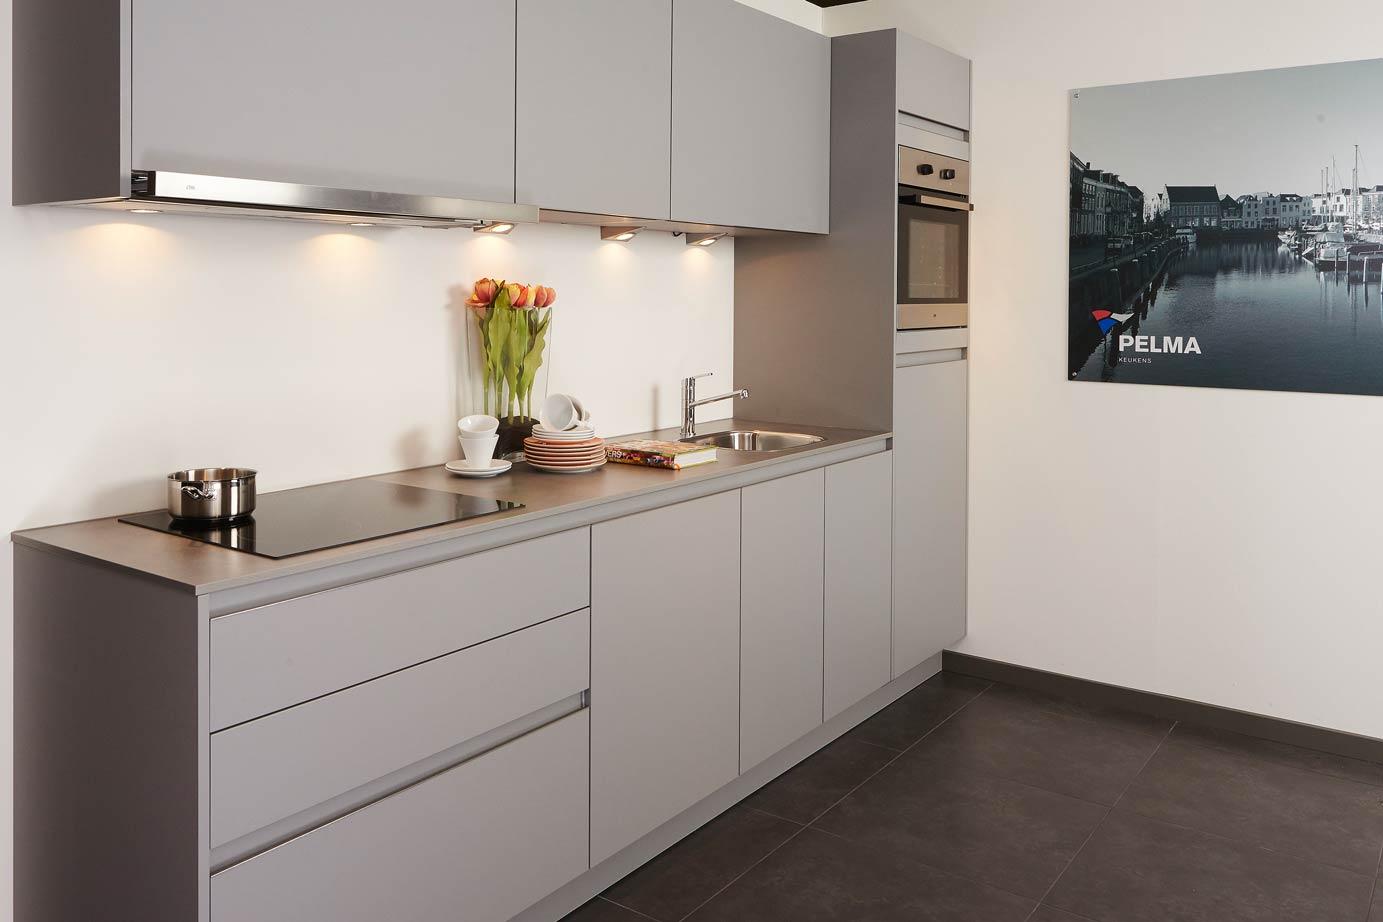 Keuken Greeploze : Greeploze keuken. Strak en modern design. – DB Keukens